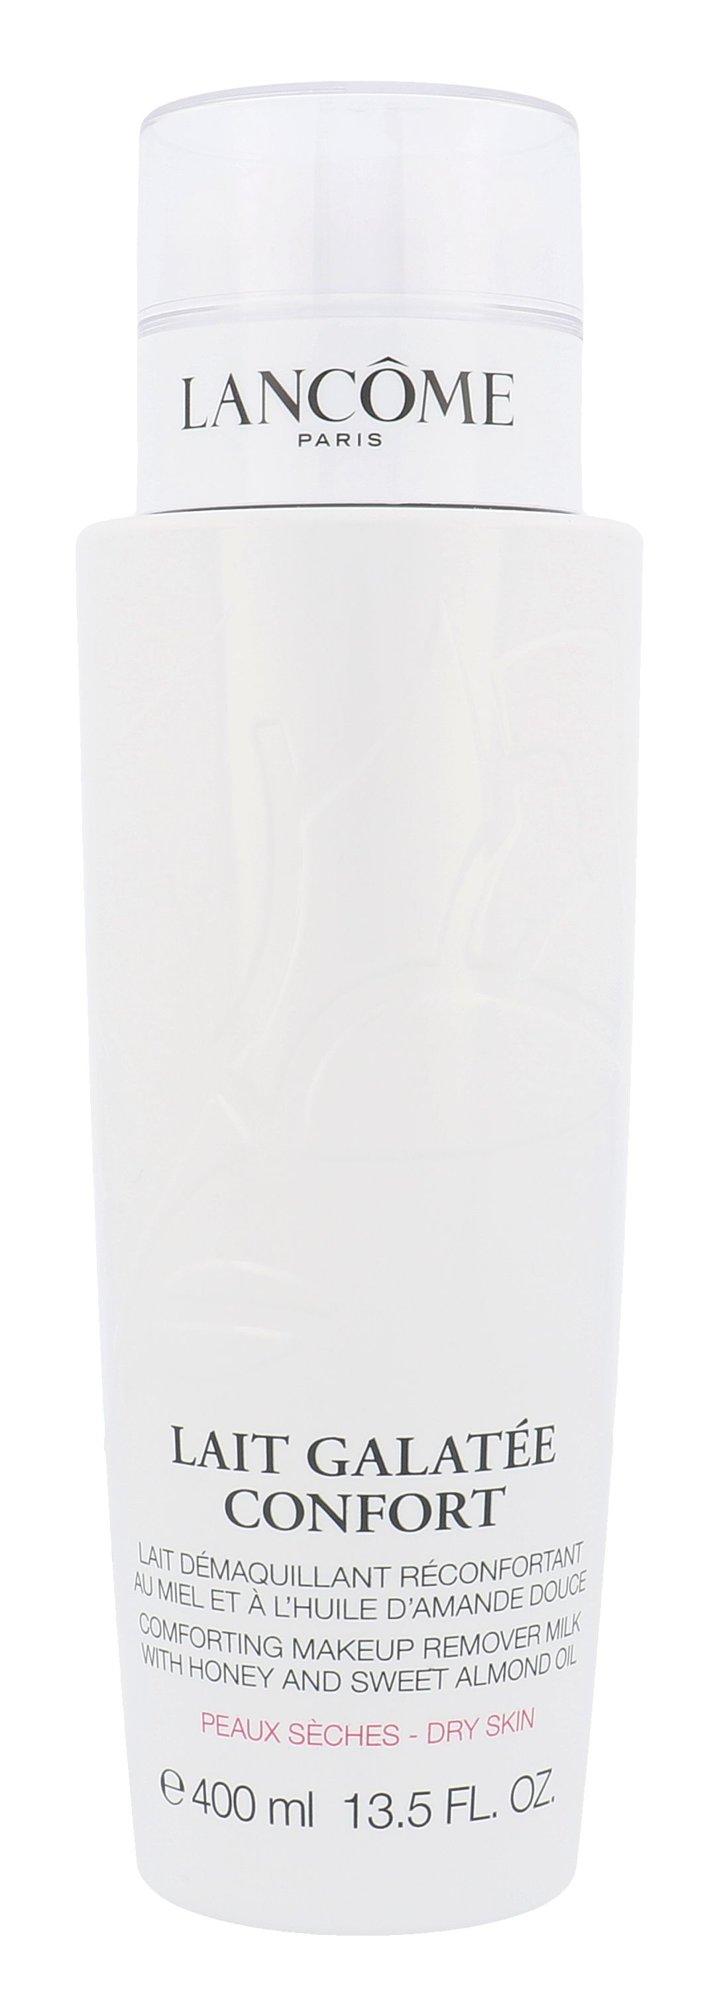 Lancôme Galatée Confort Cosmetic 400ml